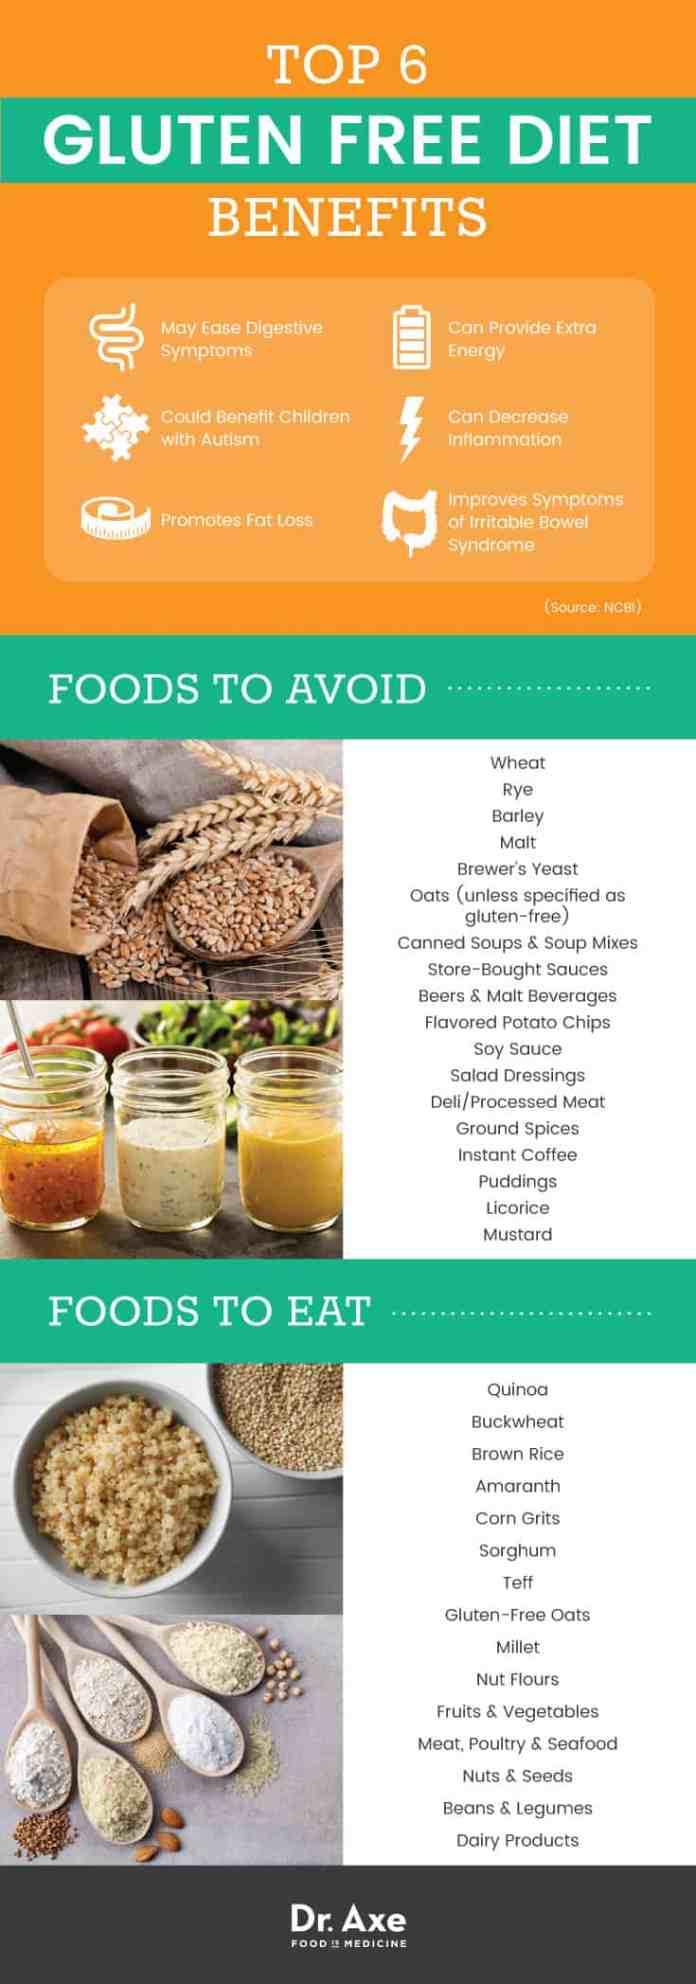 Gluten-free diet benefits and gluten-free foods - Dr. Axe